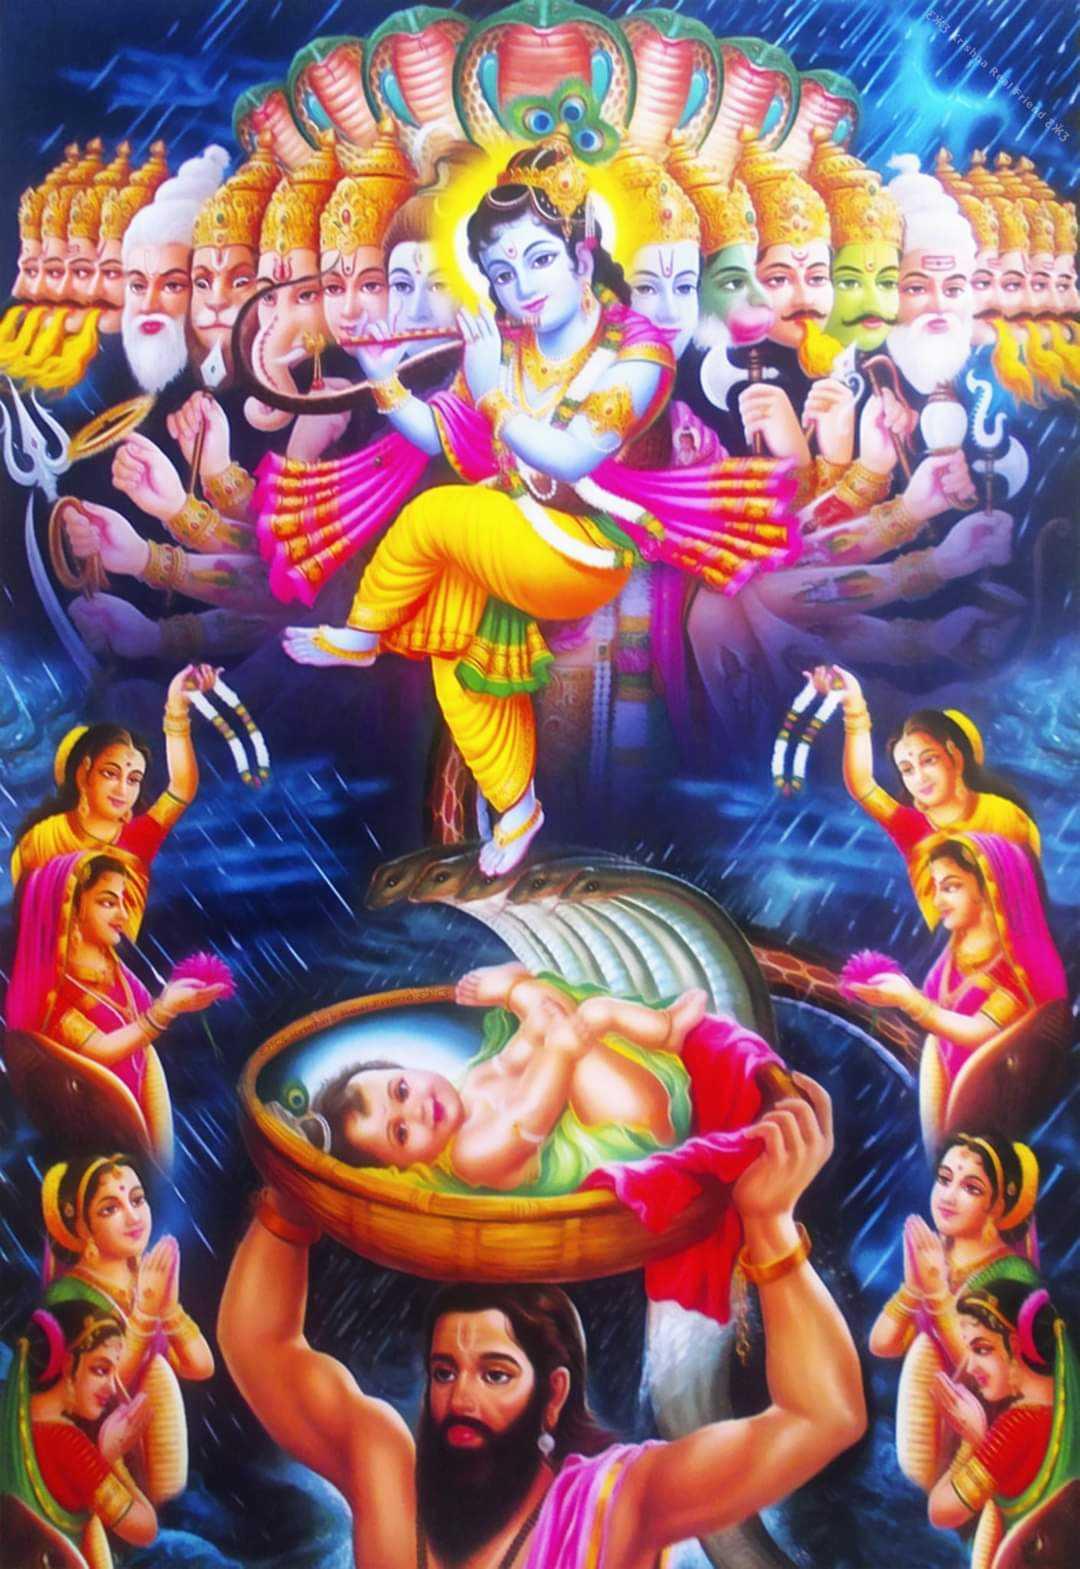 Krishna Avatar Janmashtmi Photo - Krishna awatar photo for janamasthmi wallpaper. Krishna was born in jail and his father vasudeva reach him gokul to save his life from Kans Mama.